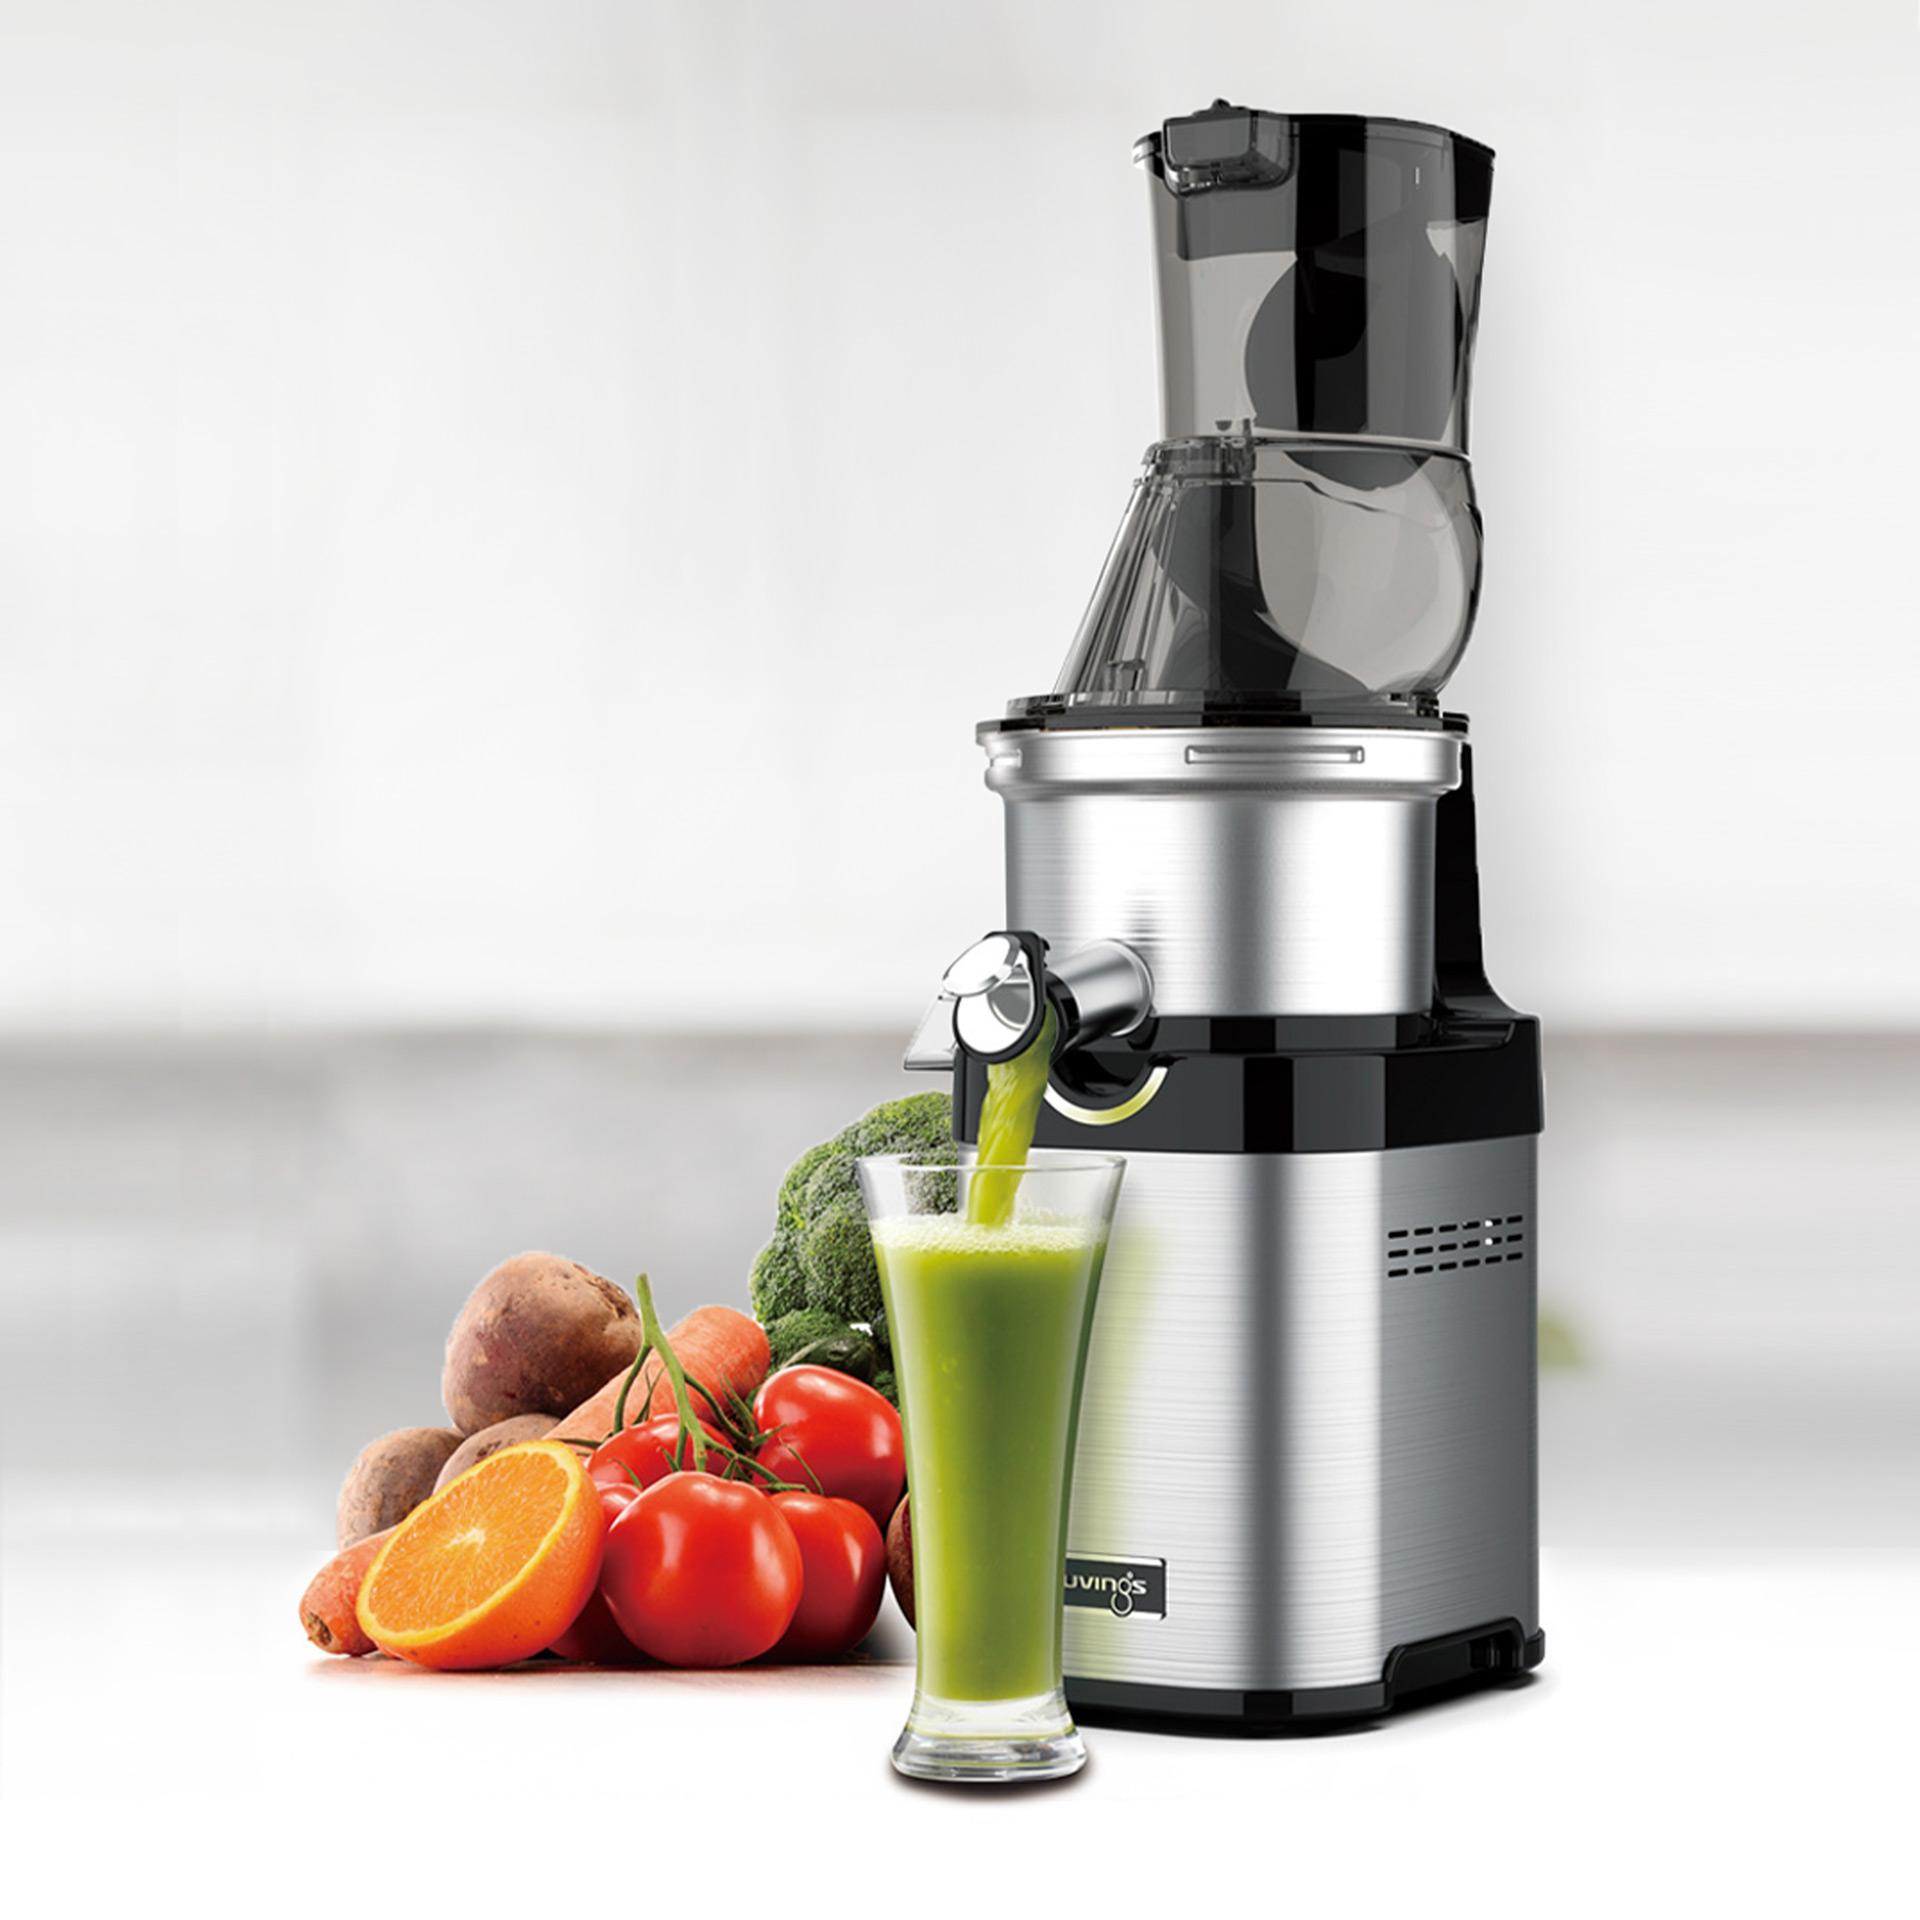 Kuvings CS700 Saftpresse mit grünem Saft dekoriert mit Obst Gemüse